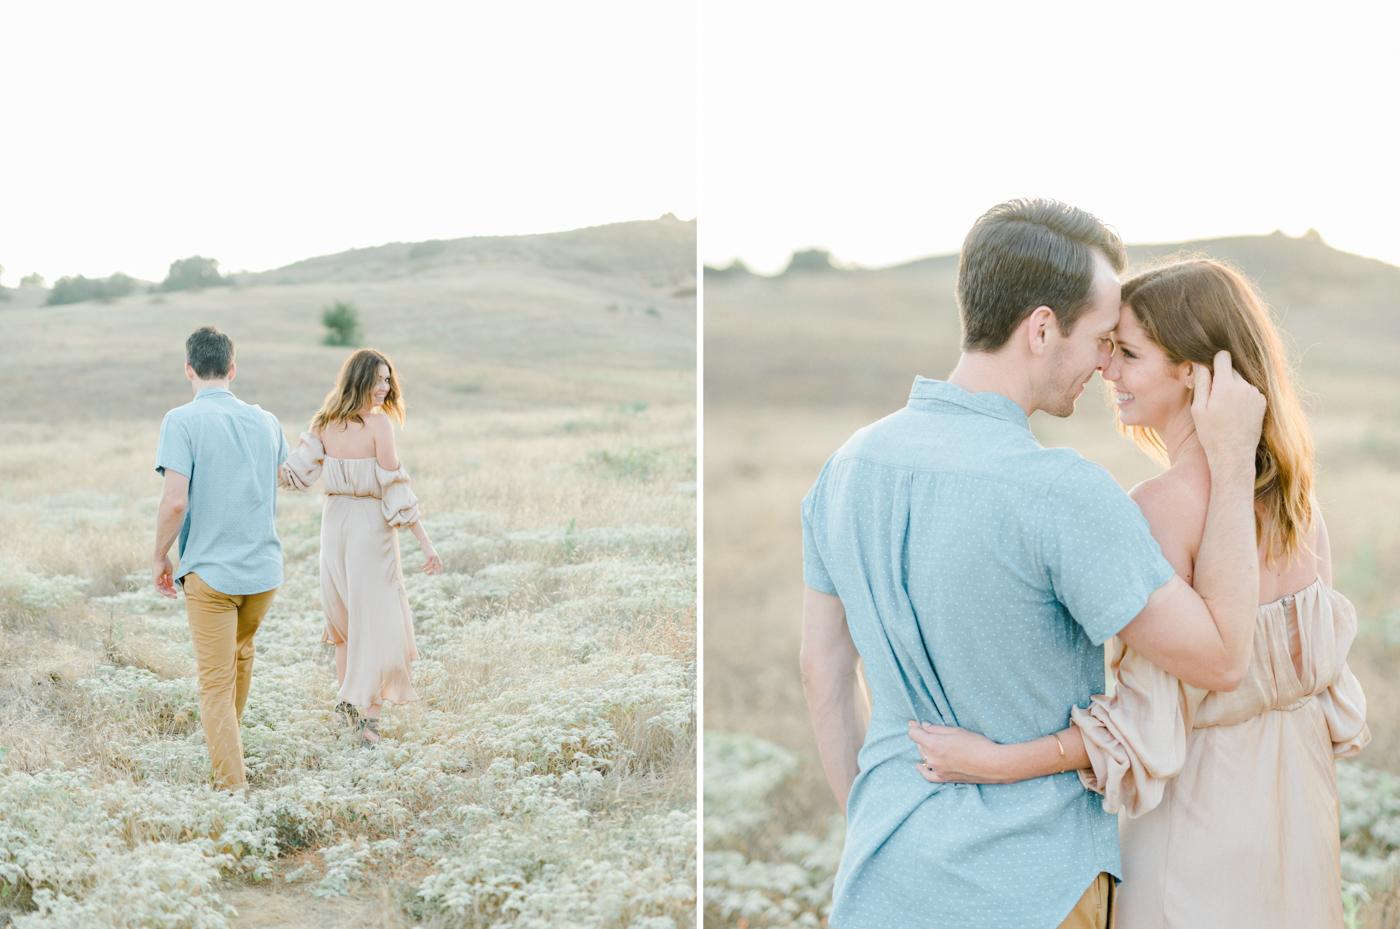 Malibu_Creek_State_Park_Romantic_Engagement_Session_C&J_romantic-21.jpg